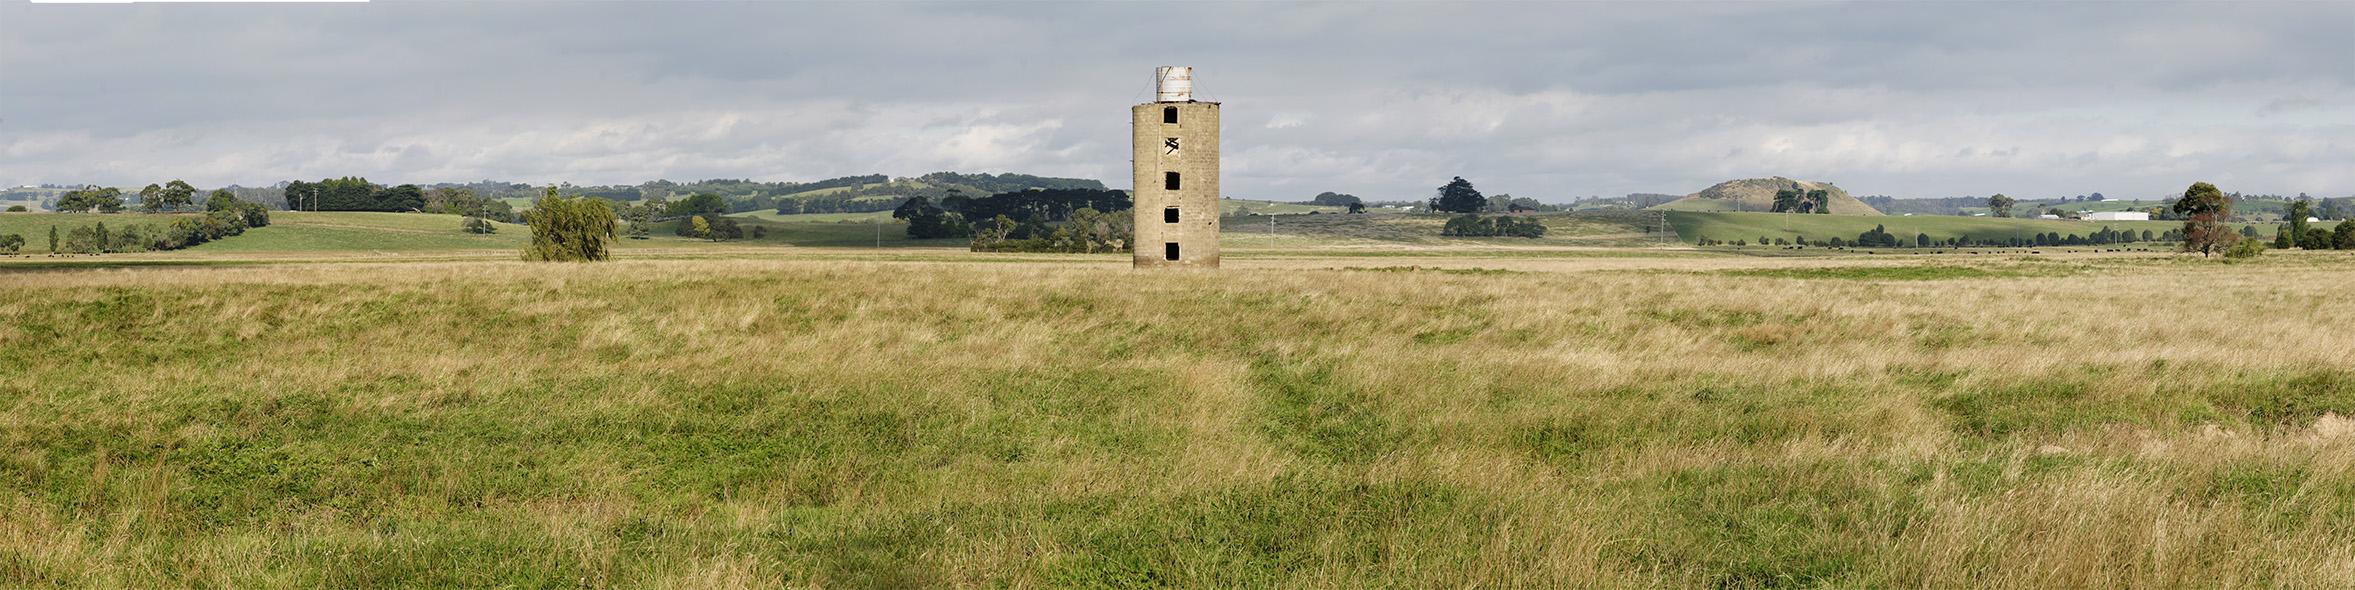 Tower - Leongatha Vic.